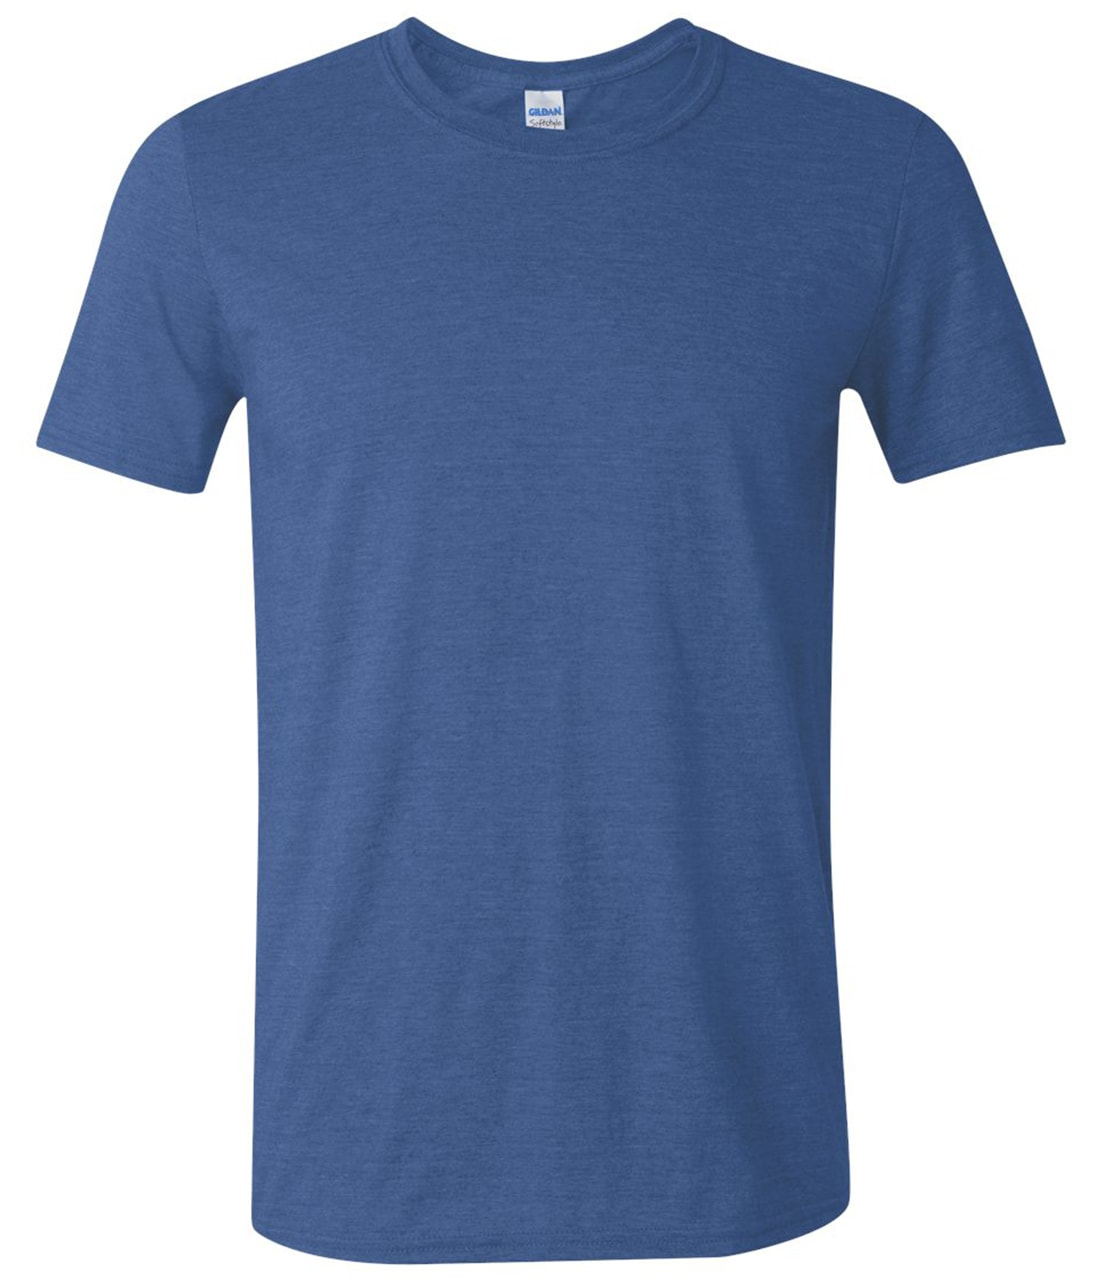 c510f0ecd27 GILDAN SoftStyle Ring Spun T-Shirt